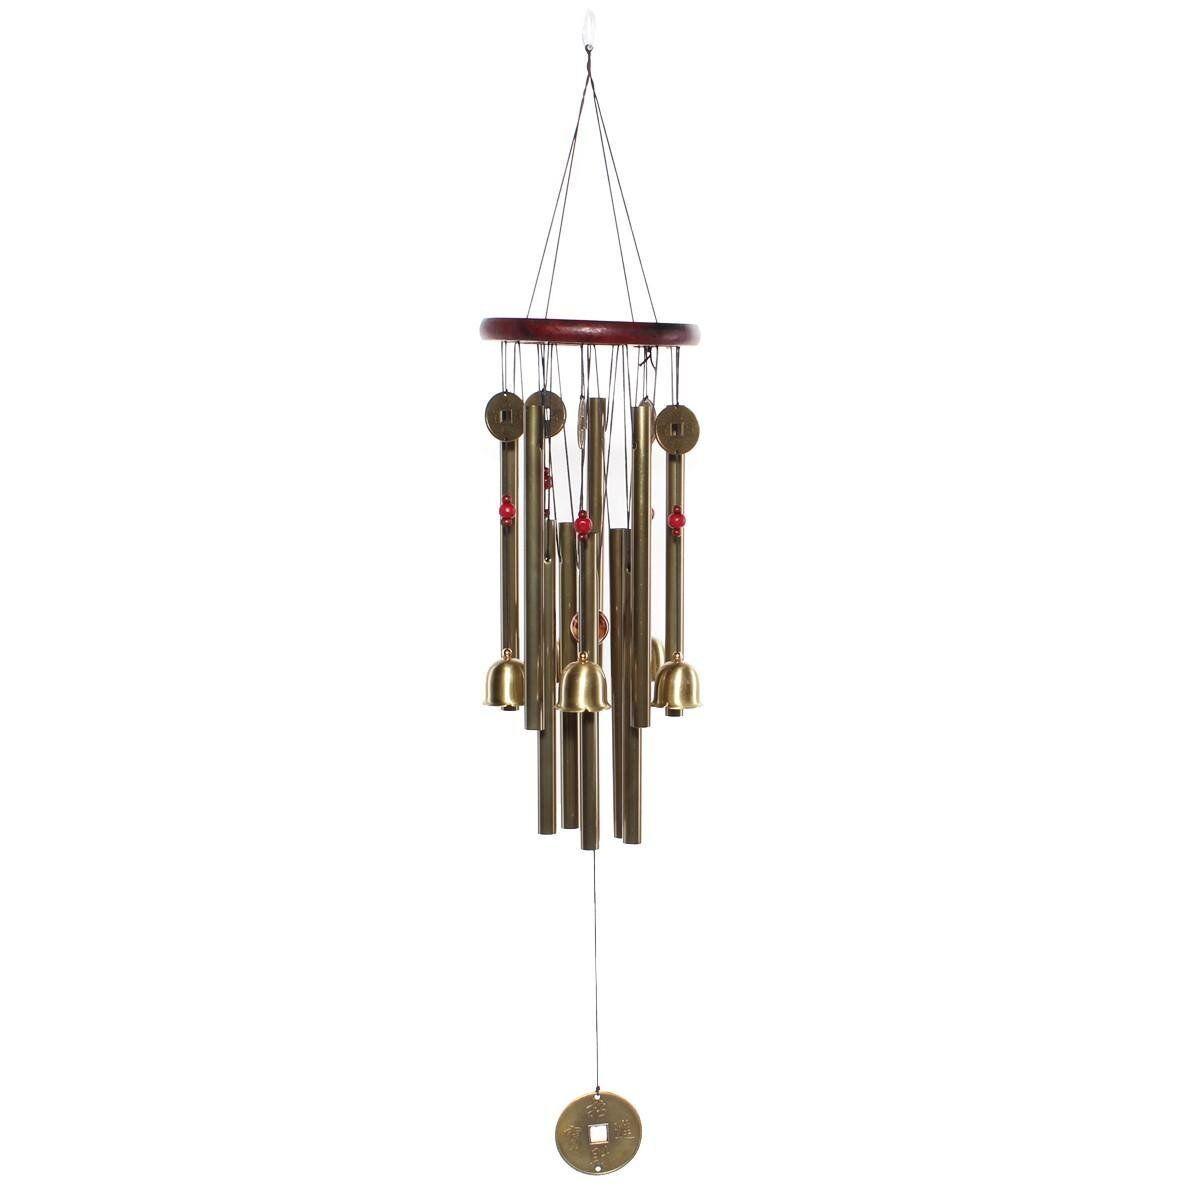 us large copper coin wind chime windchime bell yard garden. Black Bedroom Furniture Sets. Home Design Ideas